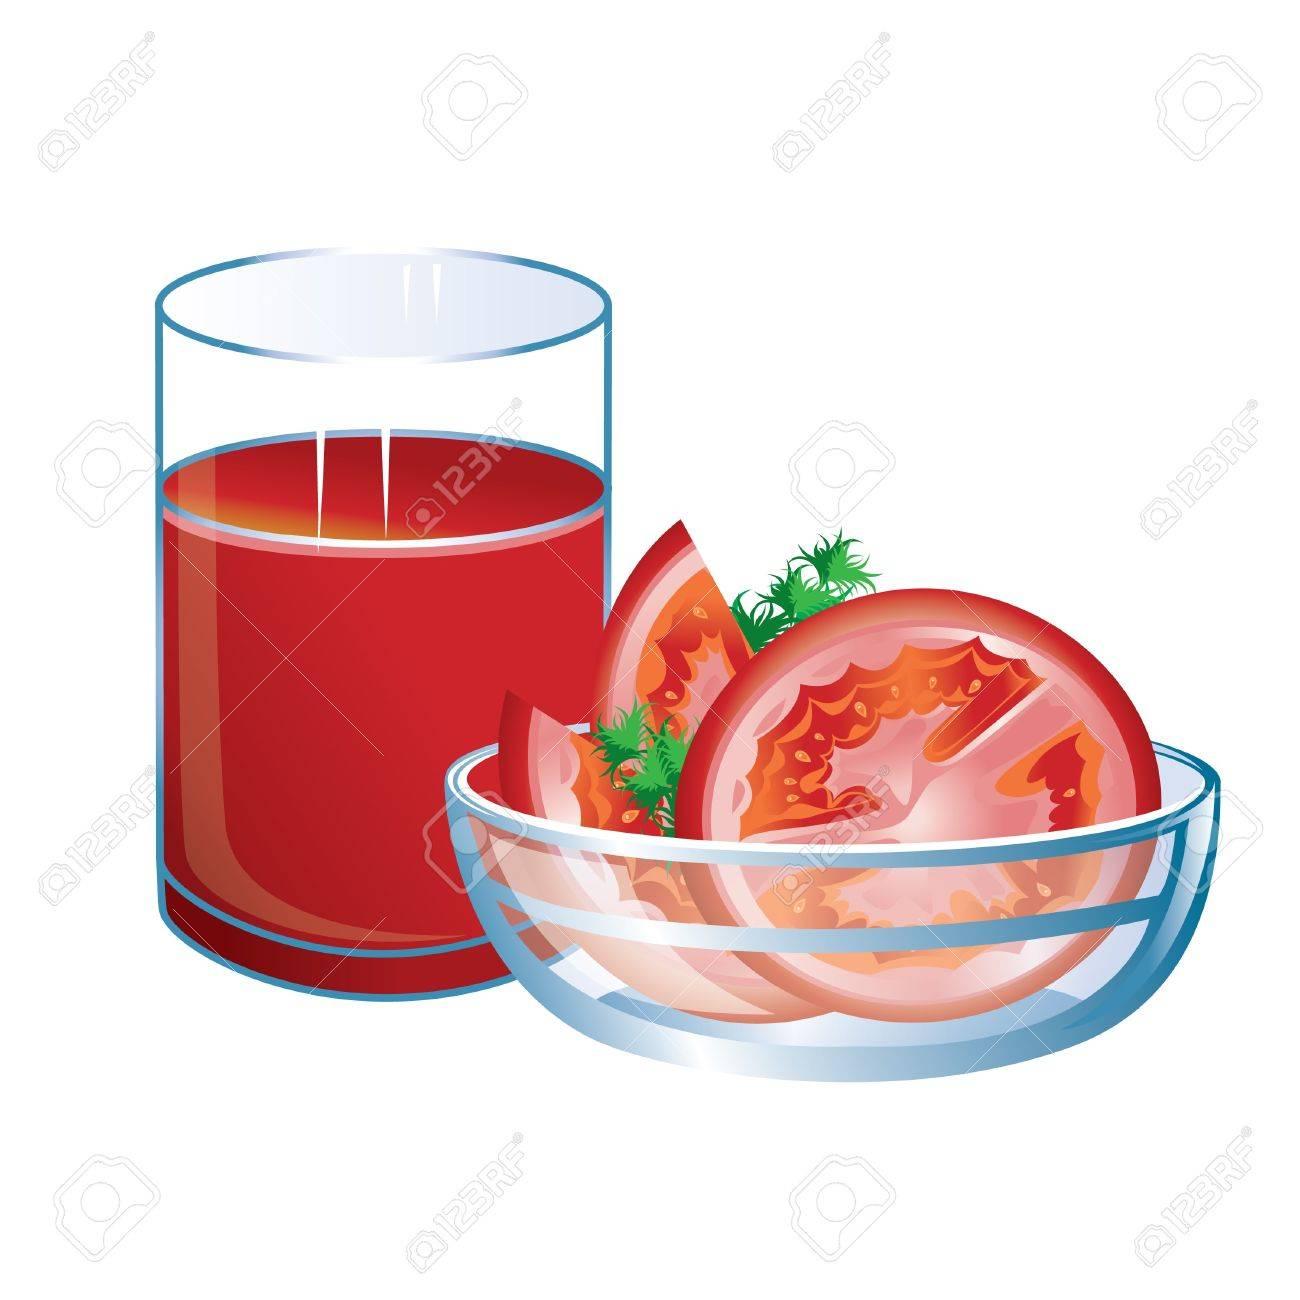 Green Juice Cartoon Green Juice Tomato Juice